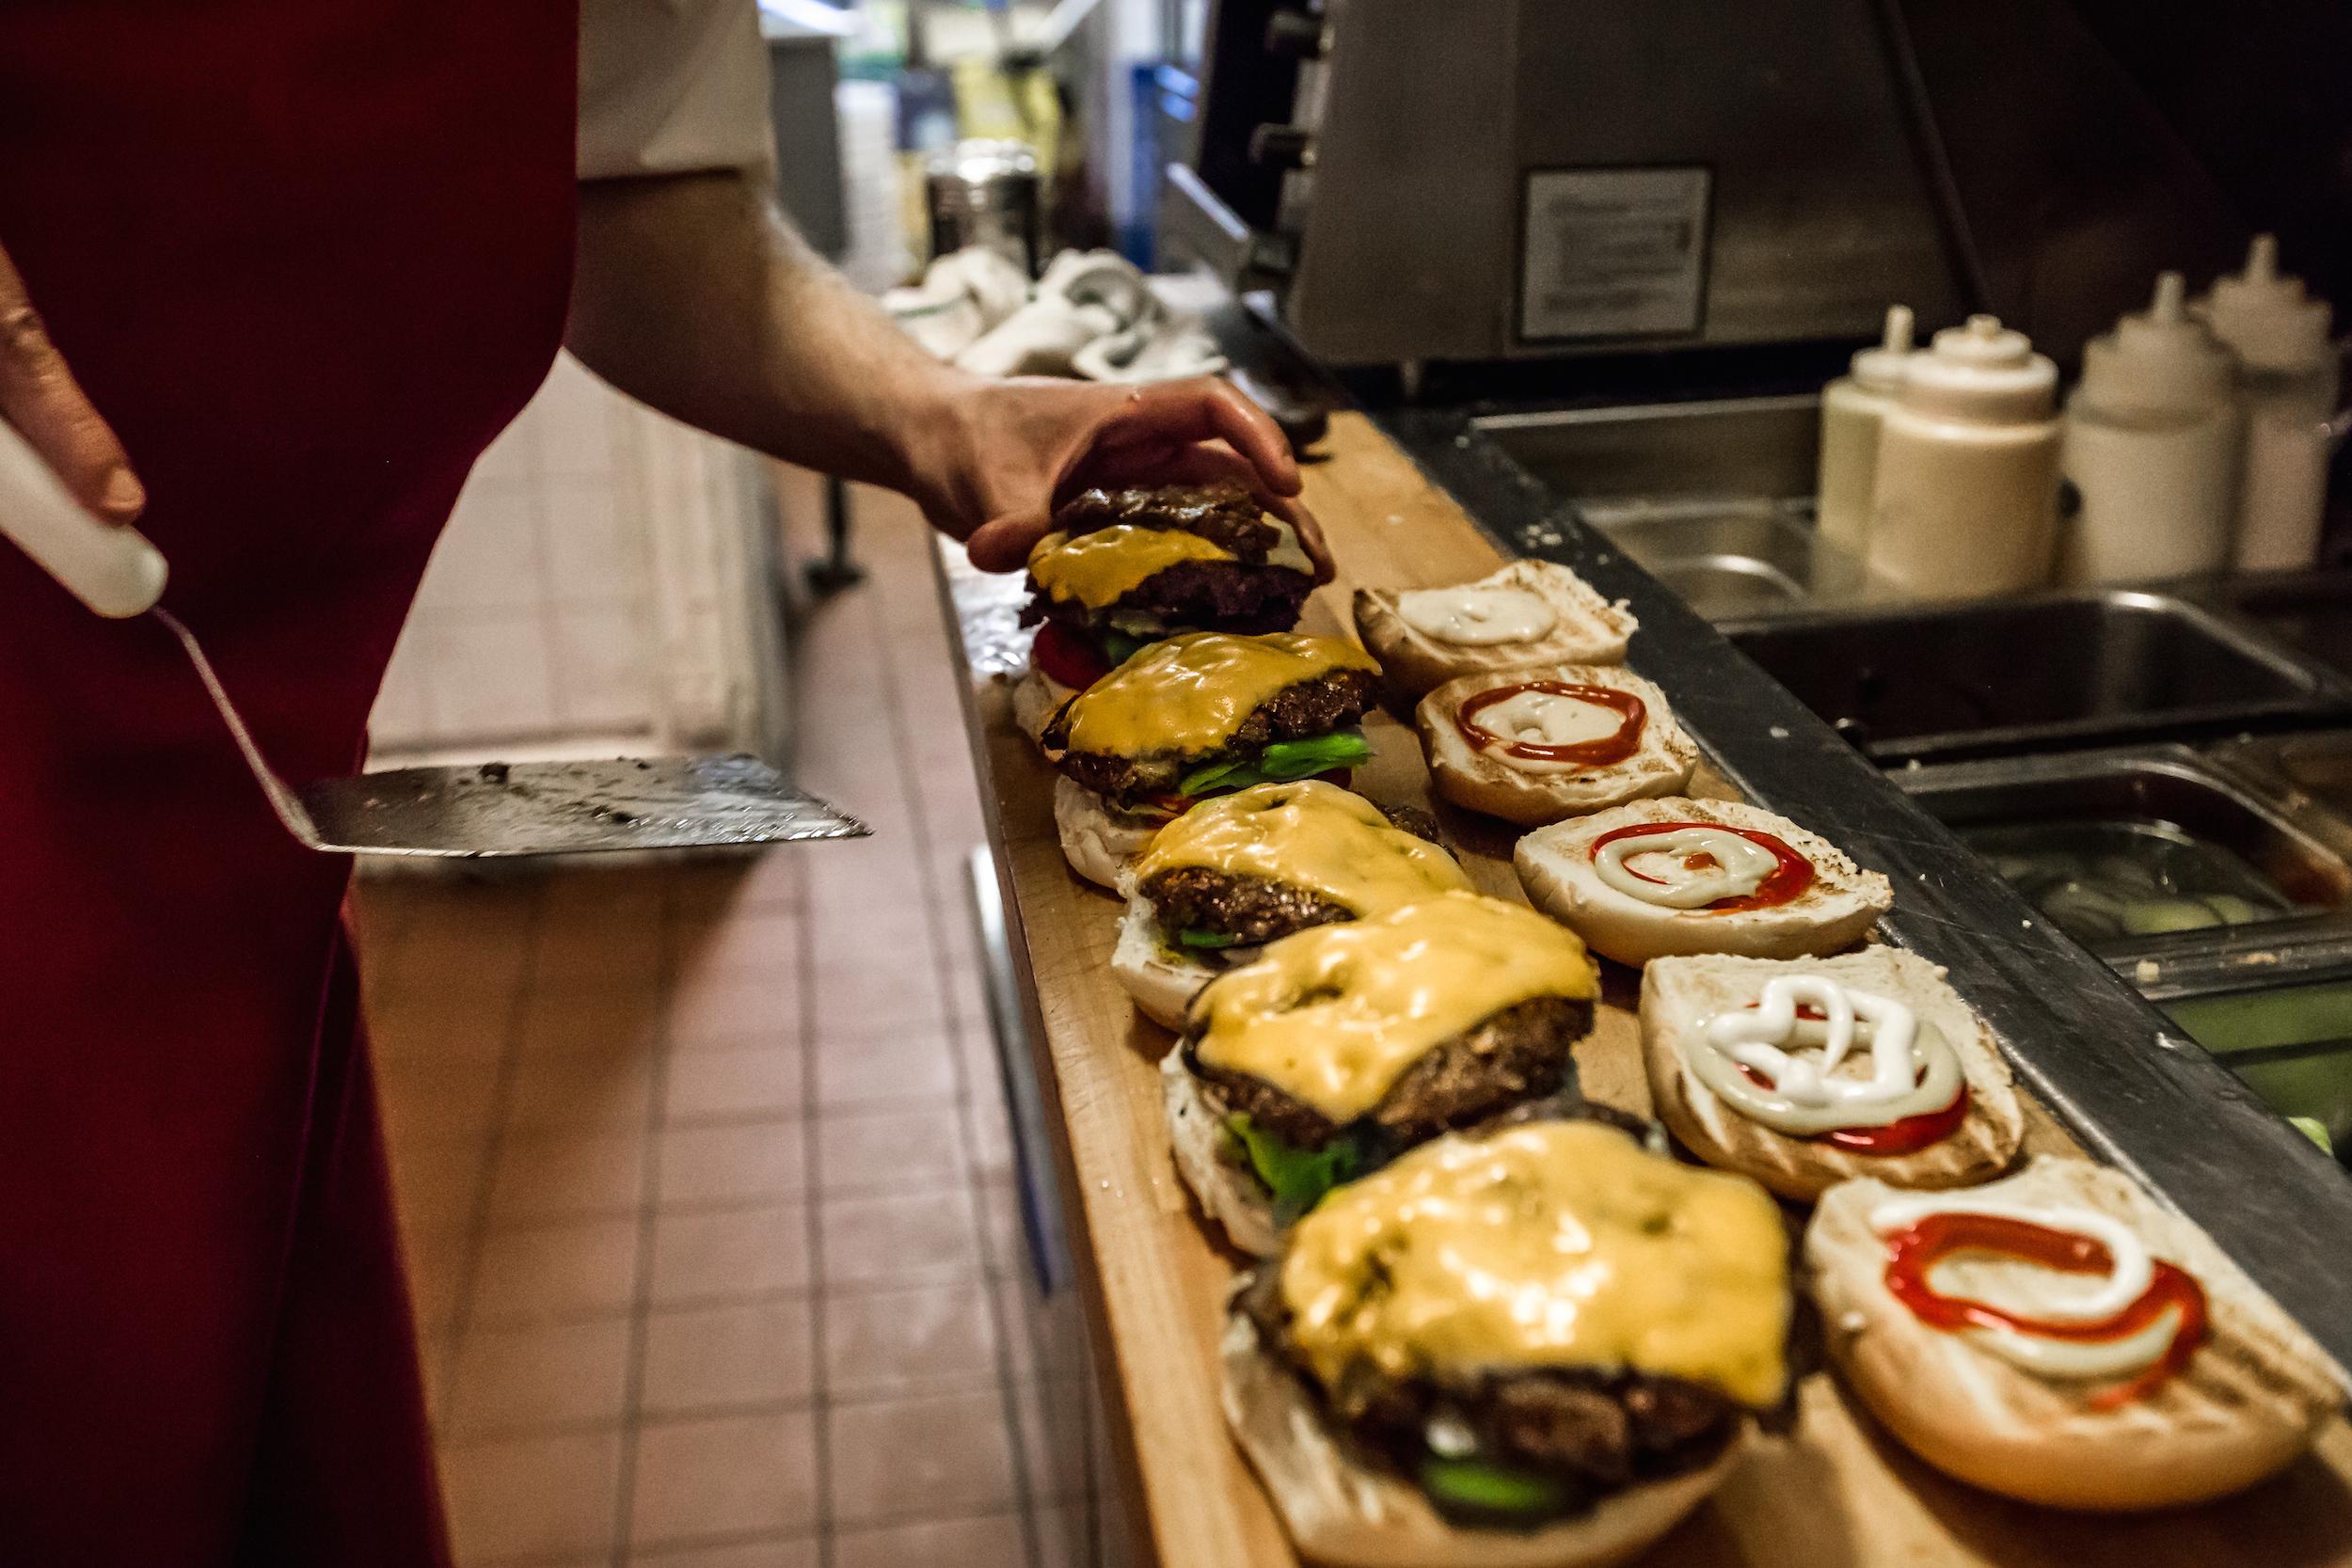 The burger line at Uniburger